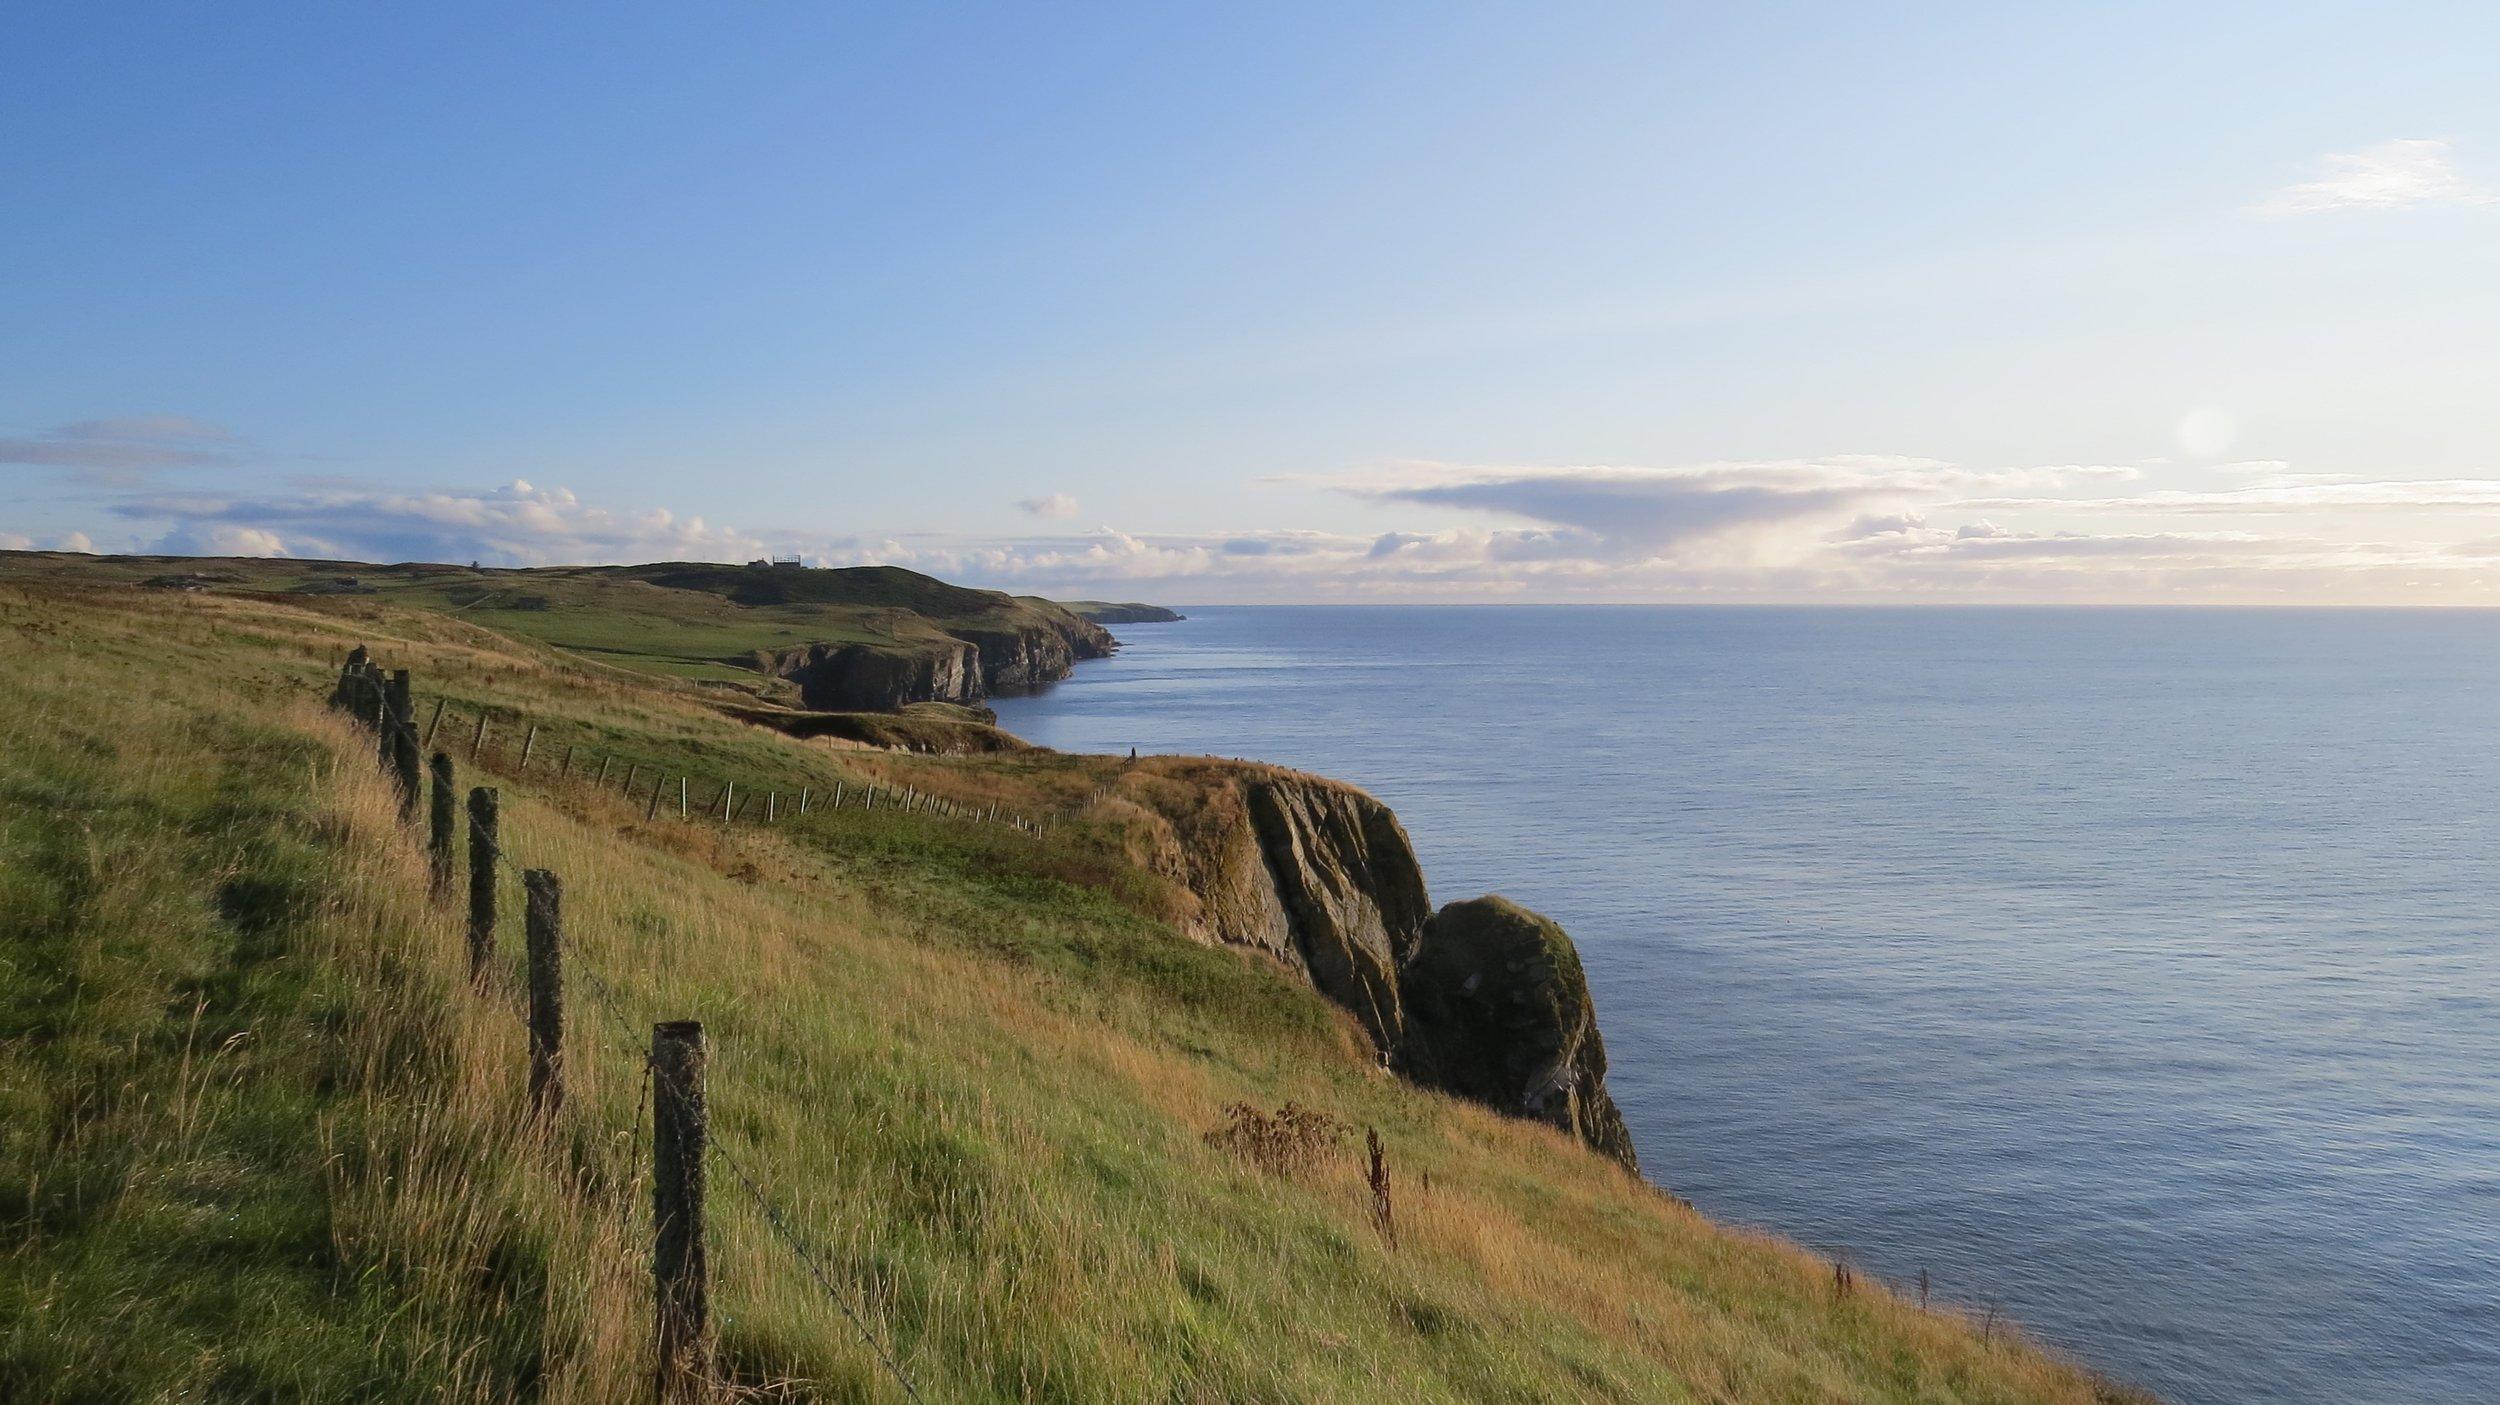 Looking back along Cliffs